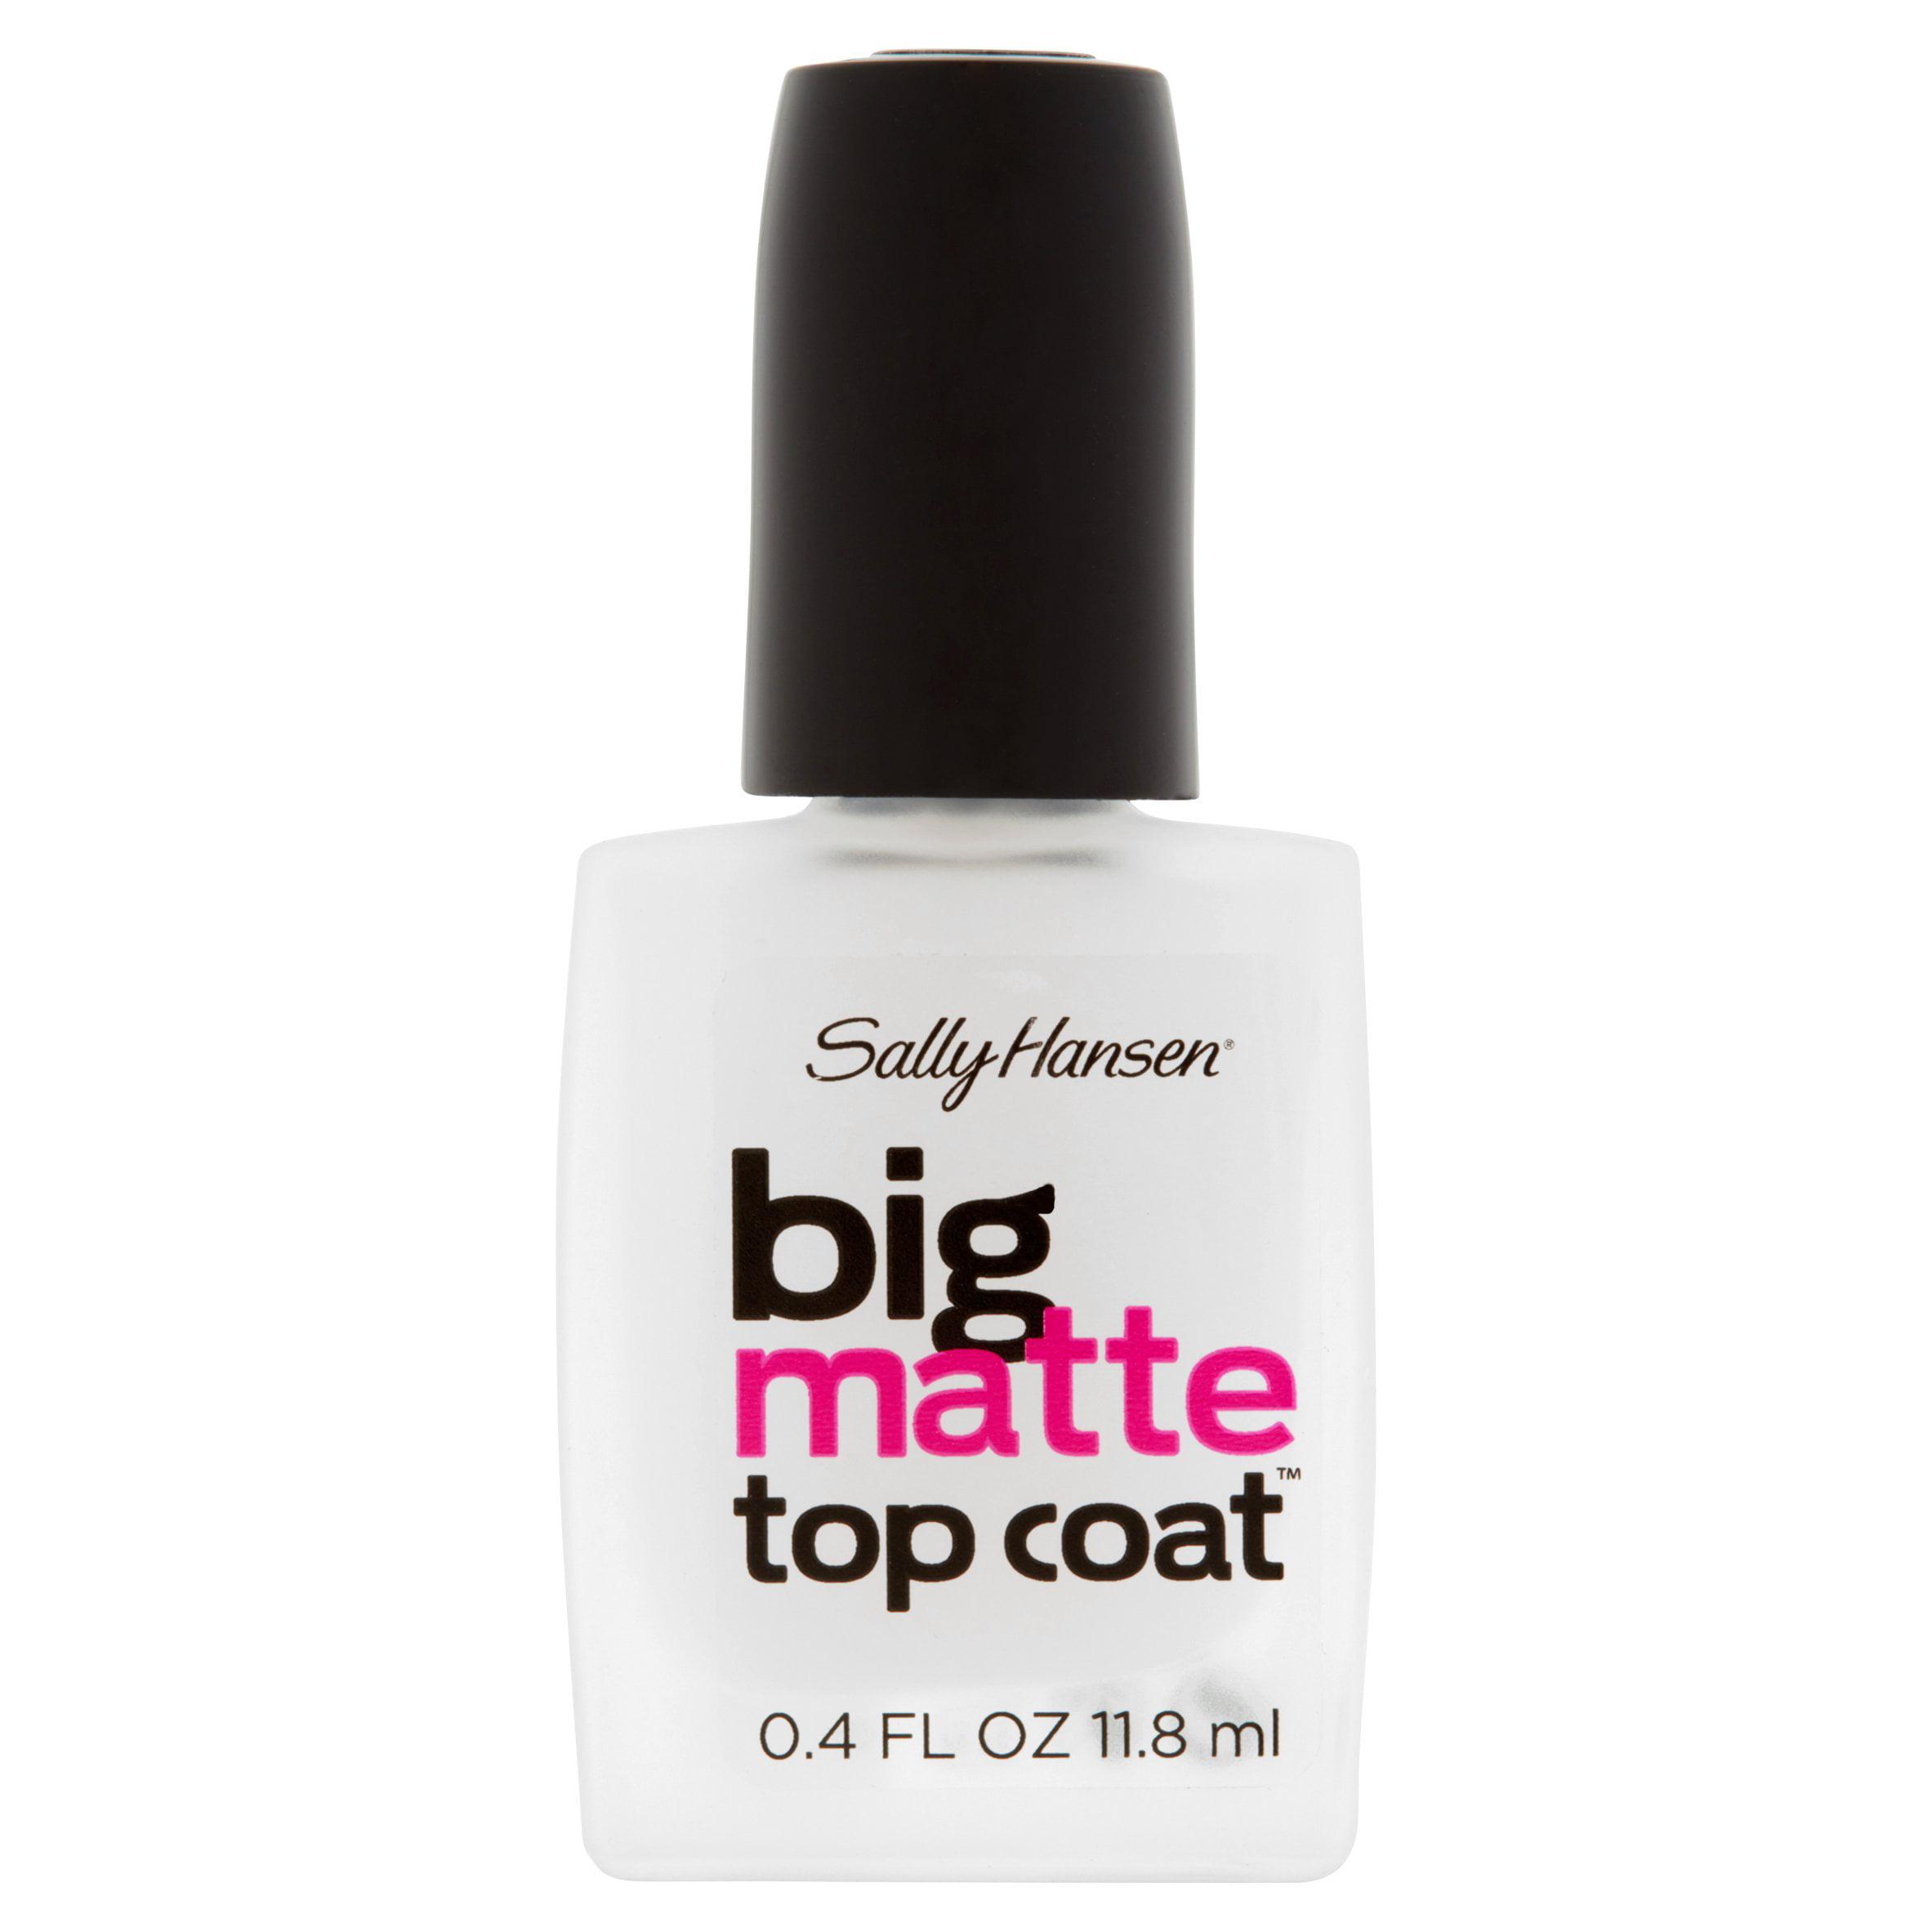 Sally Hansen 41055 Big Matte Top Coat, 0.4 fl oz